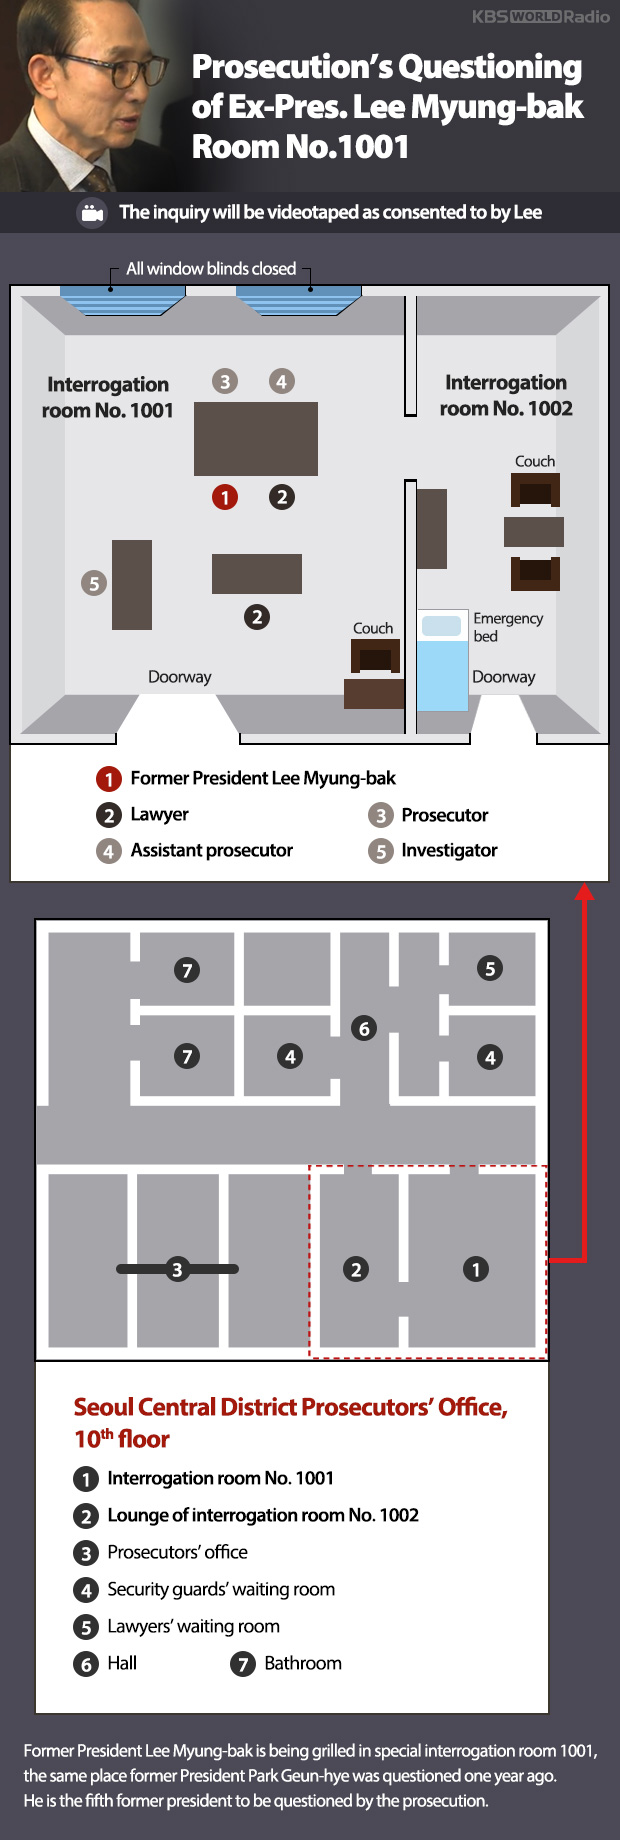 Prosecution's Questioning of Ex-Pres. Lee Myung-bak Room No.1001